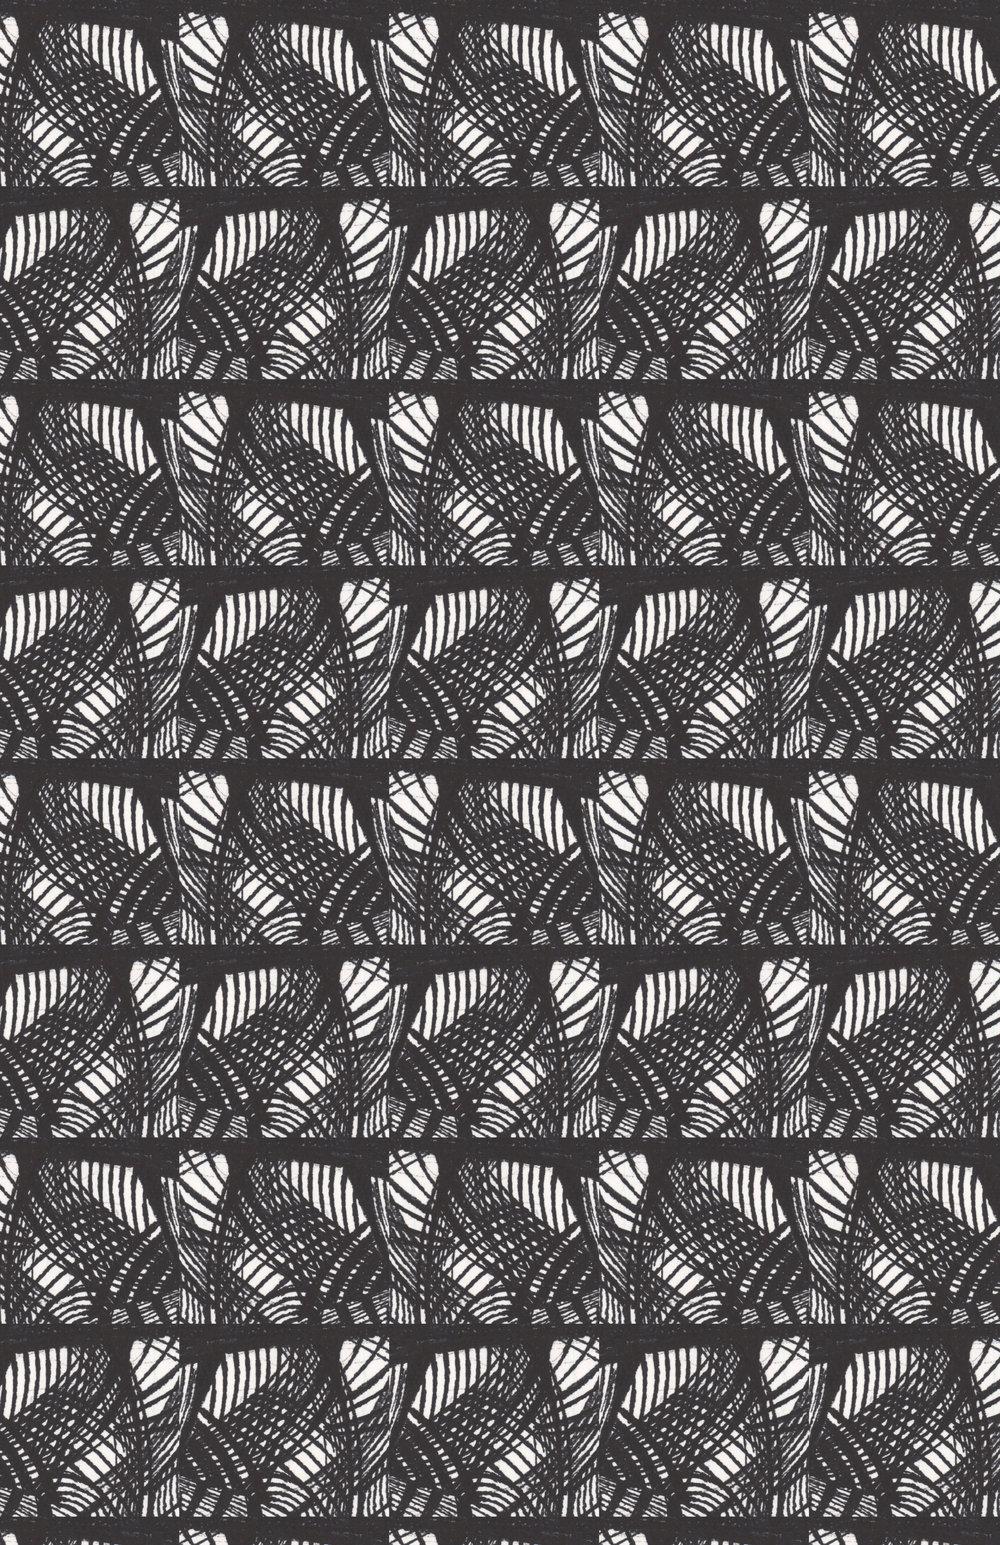 pattern1-1.jpg